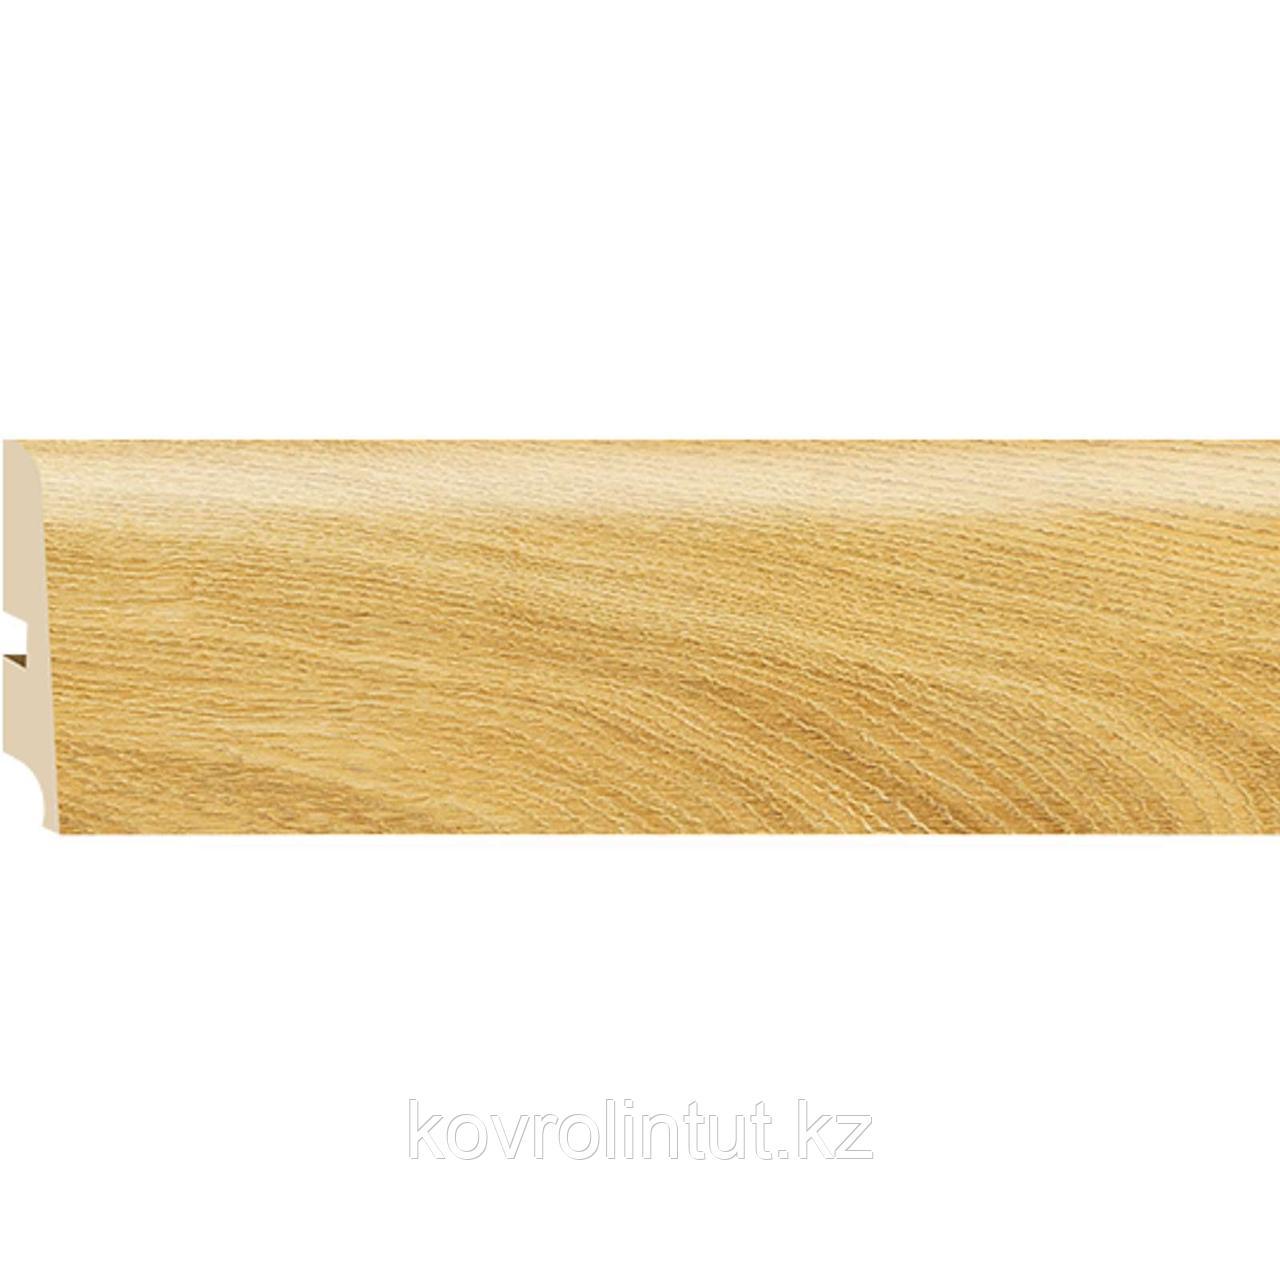 Плинтус Kronopol P85 4575 Peacock Oak, 2500х85х16мм, 9шт/уп